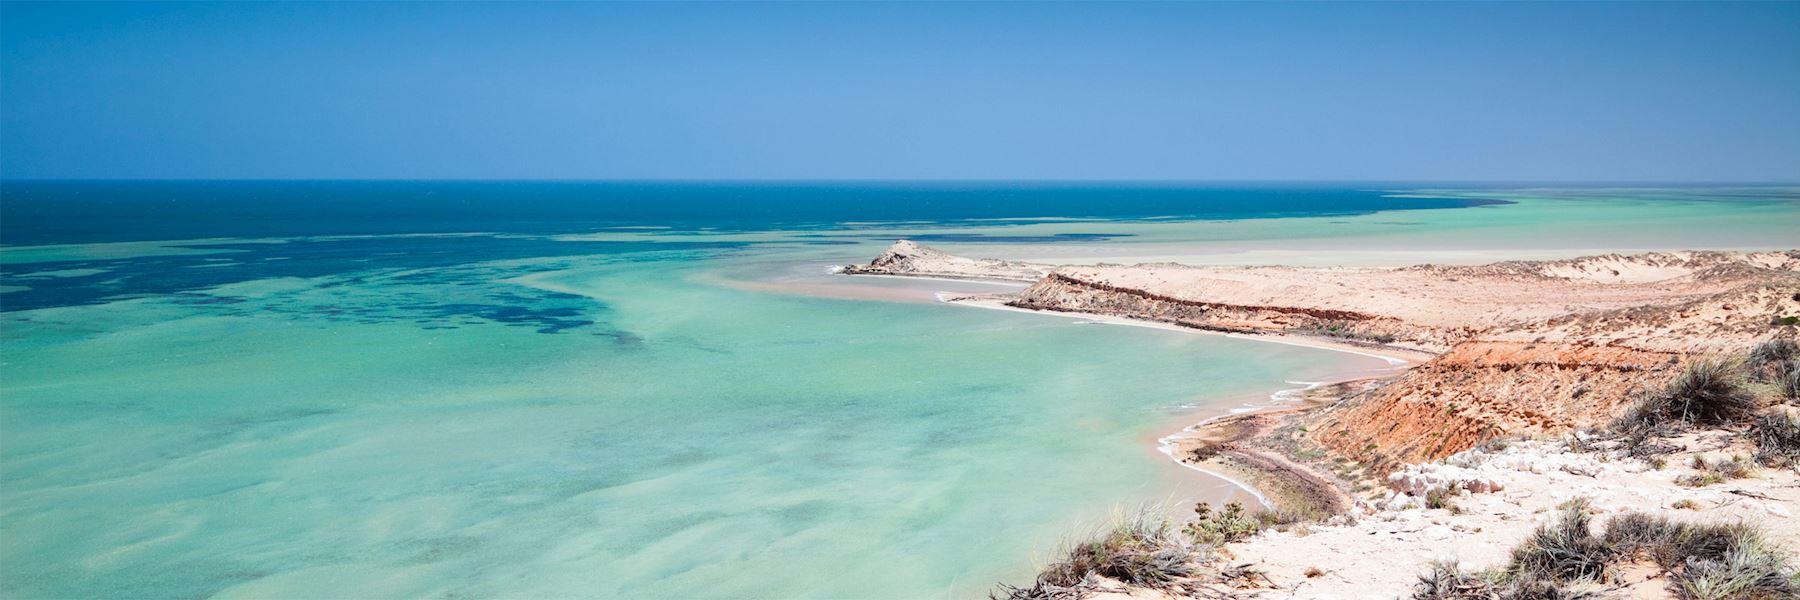 Visit Shark Bay, Australia